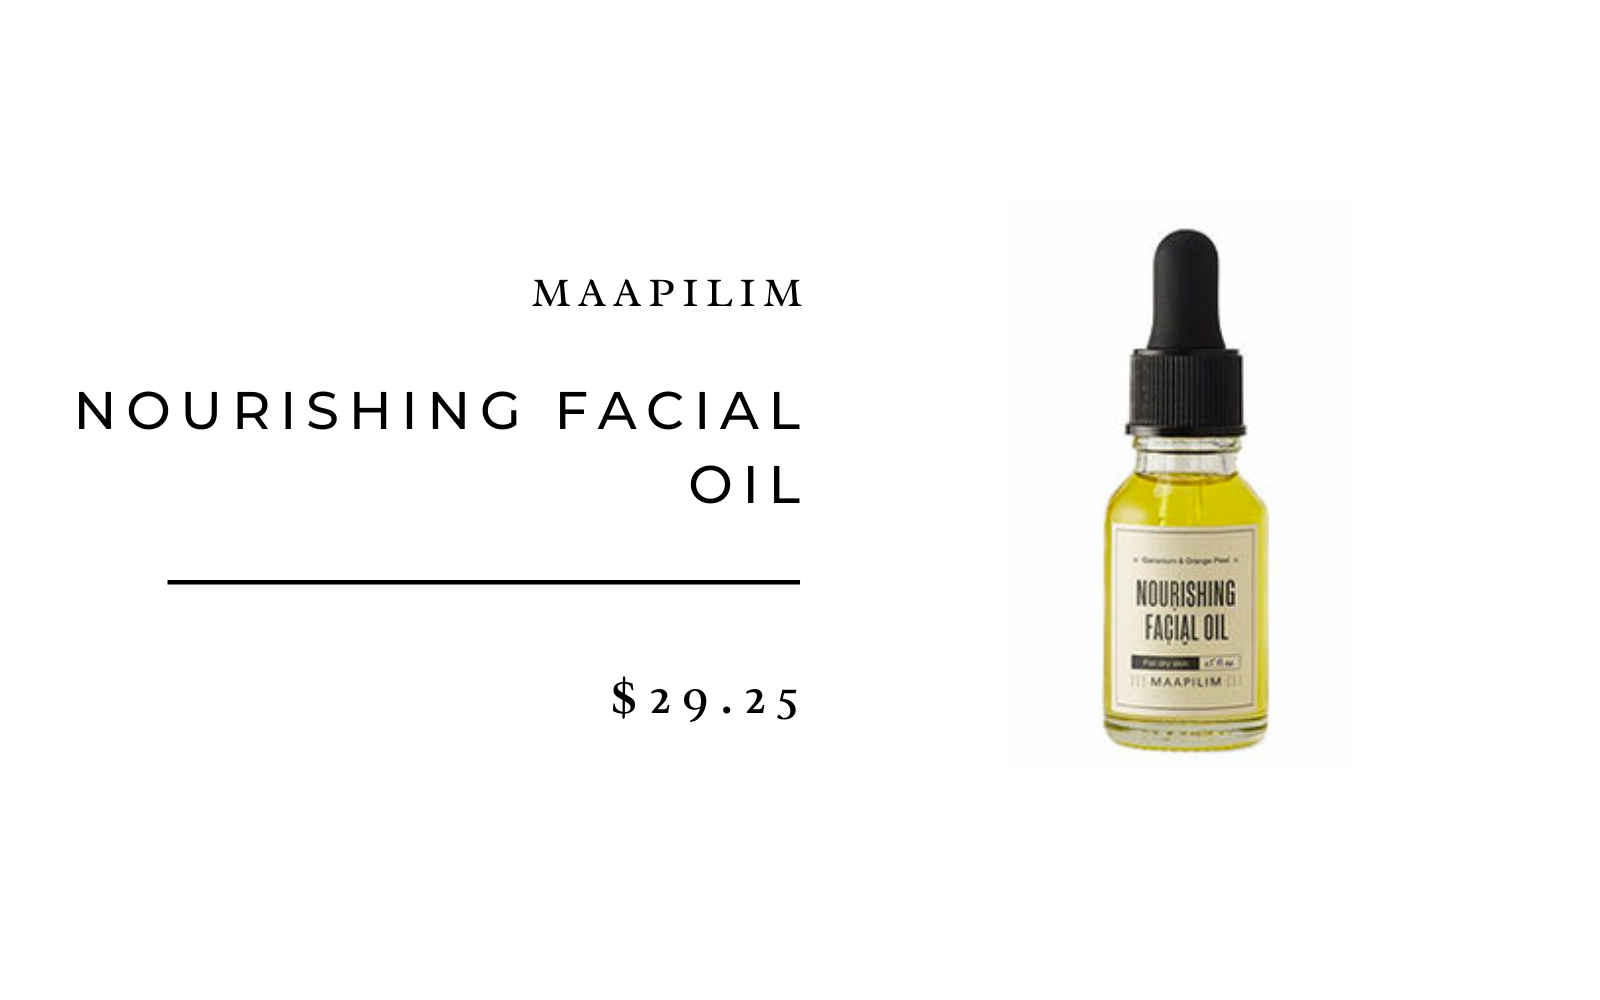 Maapilim Nourishing Facial Oil